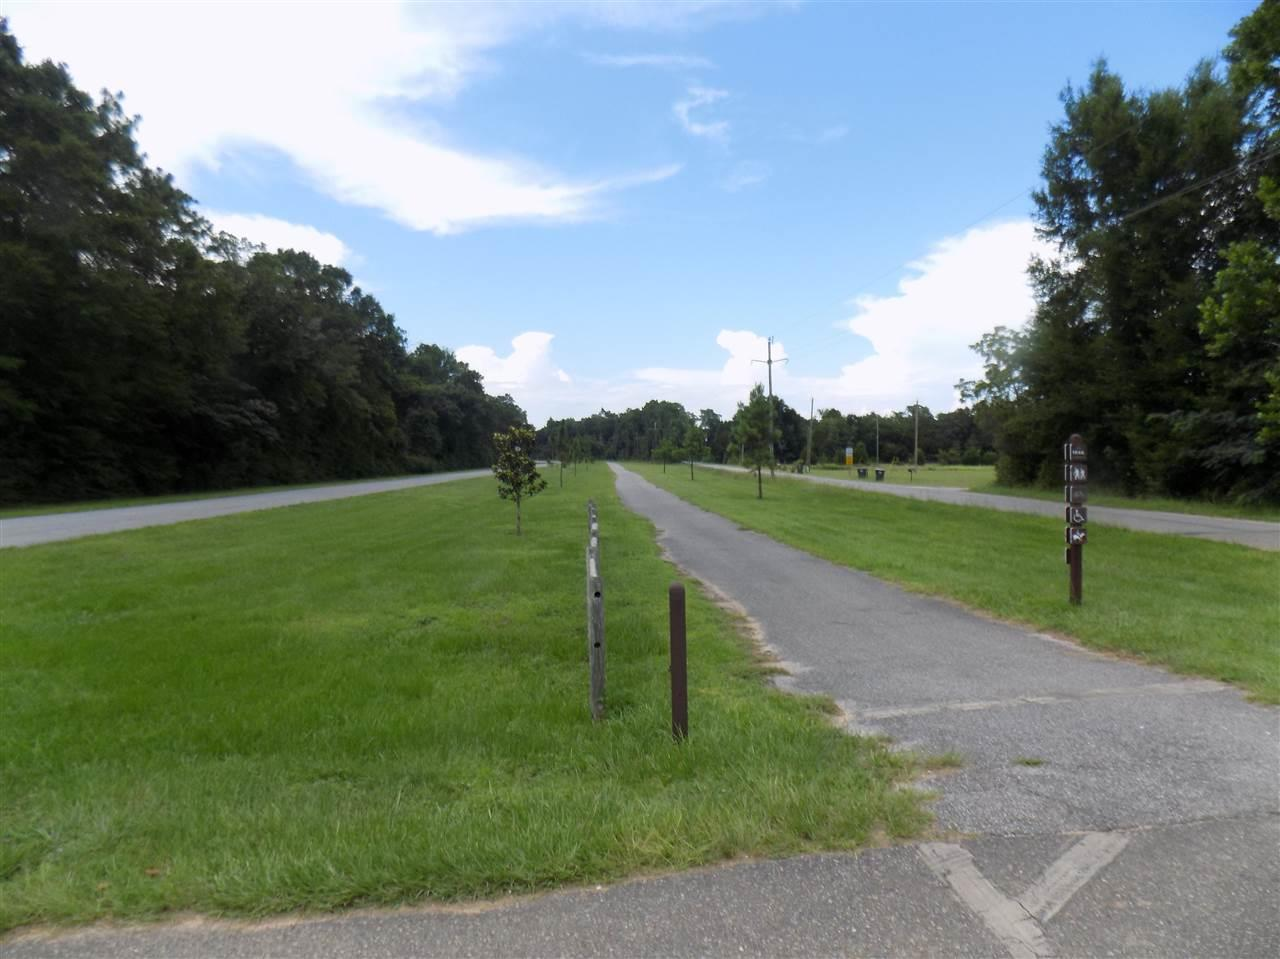 Lot 18 Whiting Field Cir, Milton, FL 32570